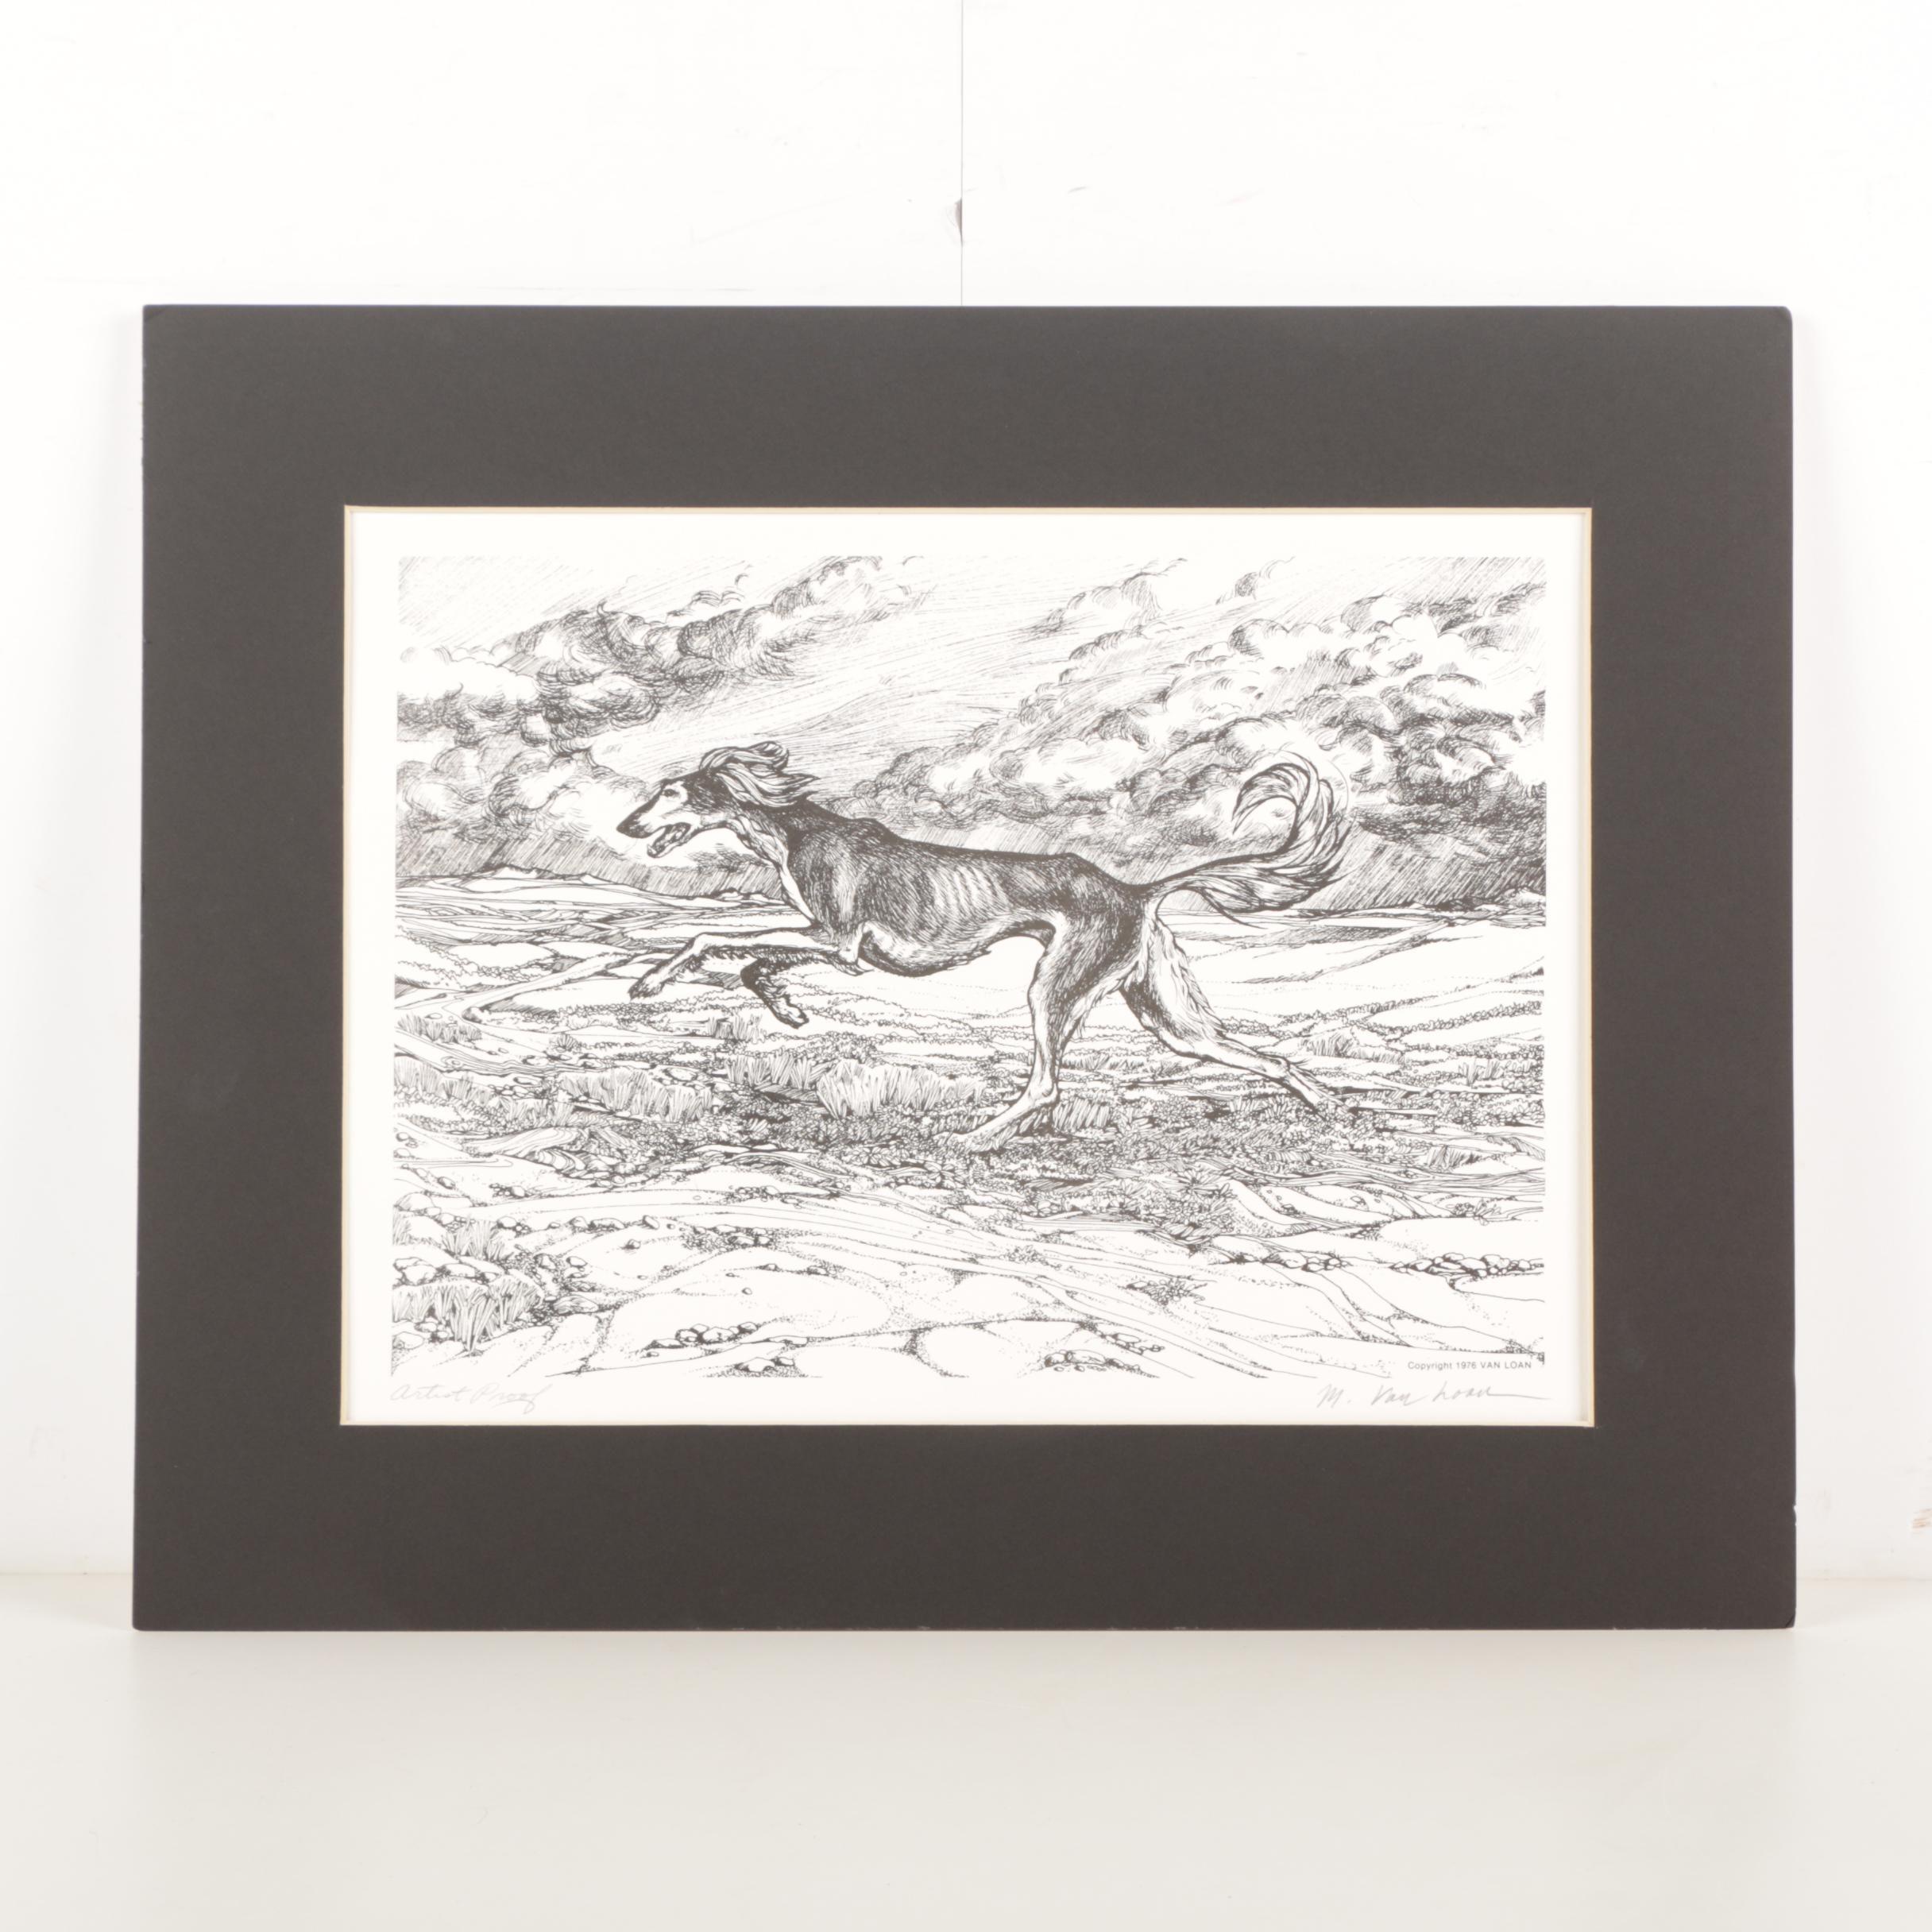 Martha Van Loan Artist's Proof Lithograph on Paper